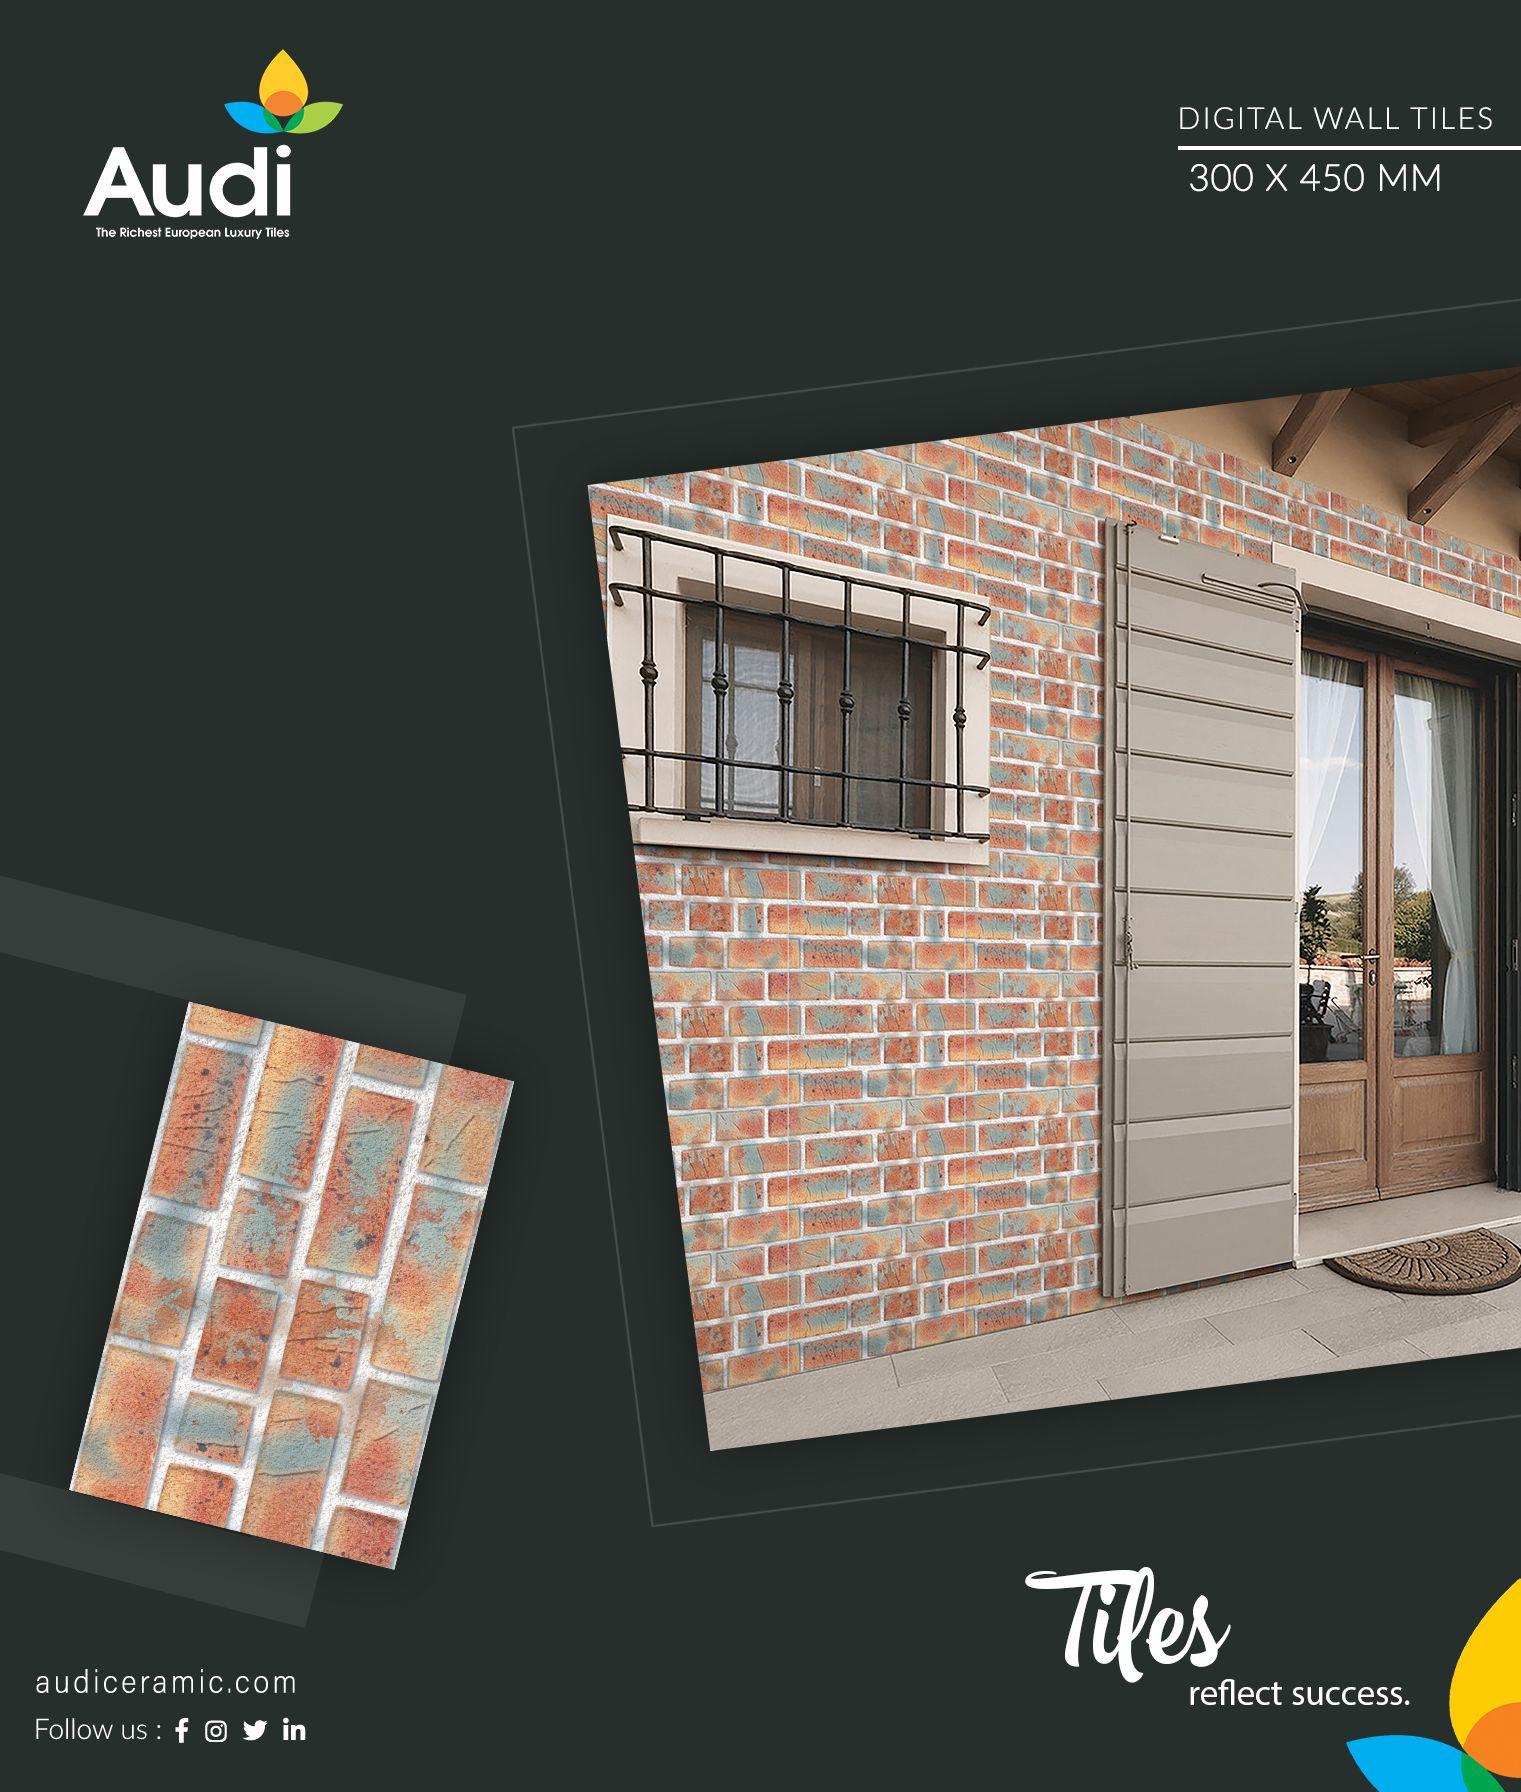 Tiles Reflect Success Audiceramic Homedecor Ceramictiles Walltiles Brand Interior Besttiles Morbi Exporter With Images Ceramic Wall Tiles Digital Wall Tiles